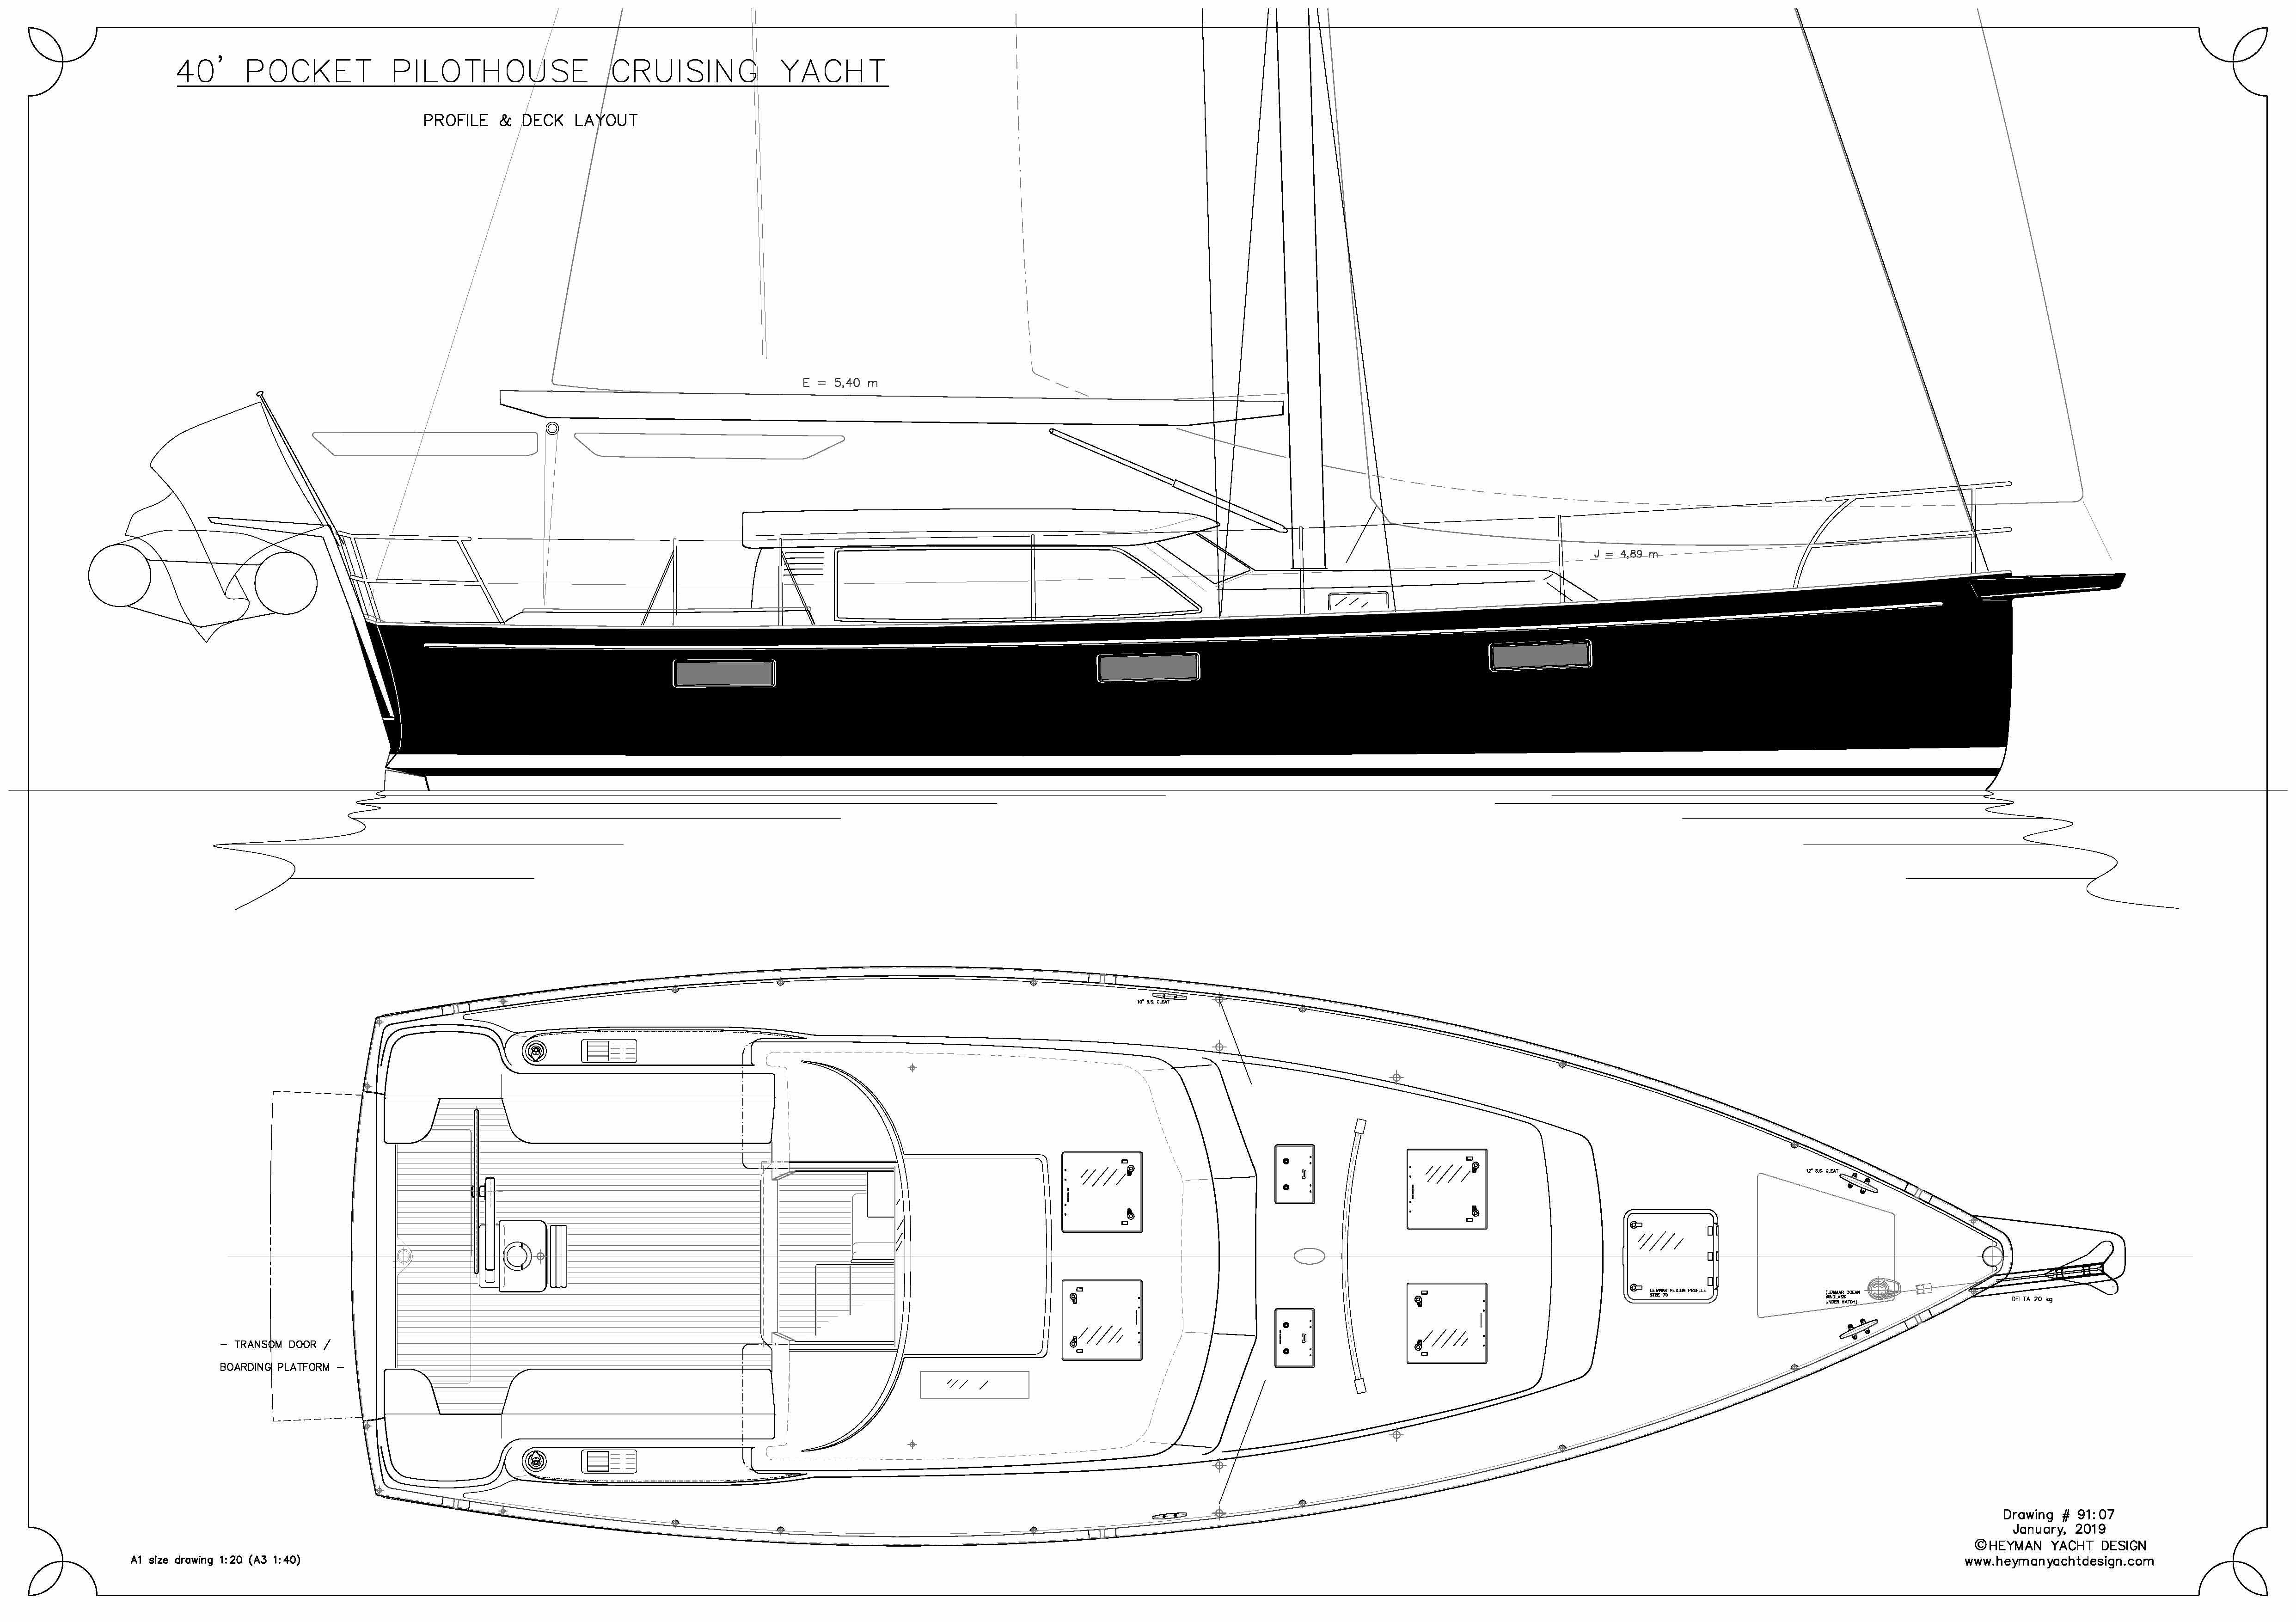 40' PPH, Pocket Pilot House Sailing Yacht - Heyman Yachts